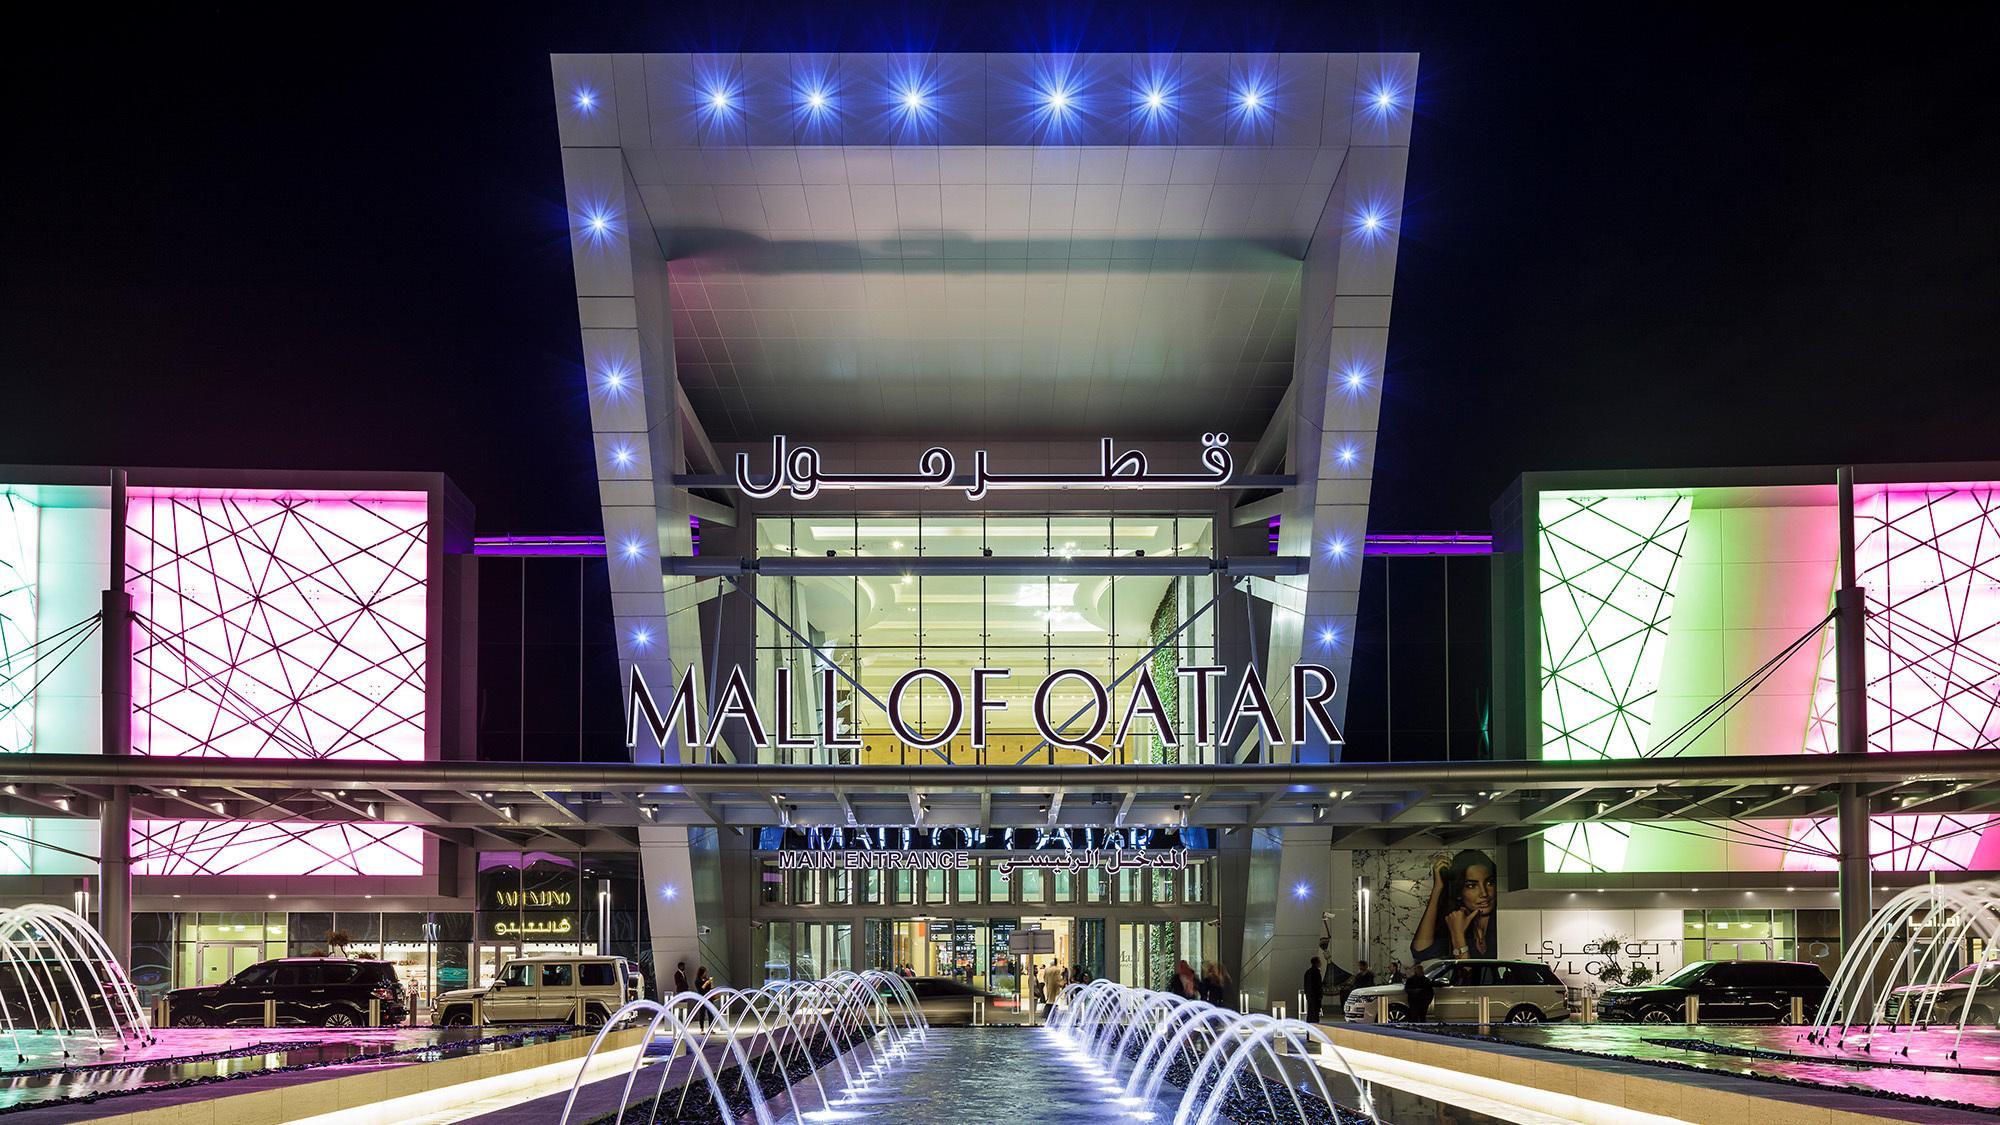 النادي العربي الرياضي ) is a qatari sports club based in doha.founded in 1952, the most prominent team of the club is the football team that competes in the qatar stars league. Chapman Taylor   Mall of Qatar